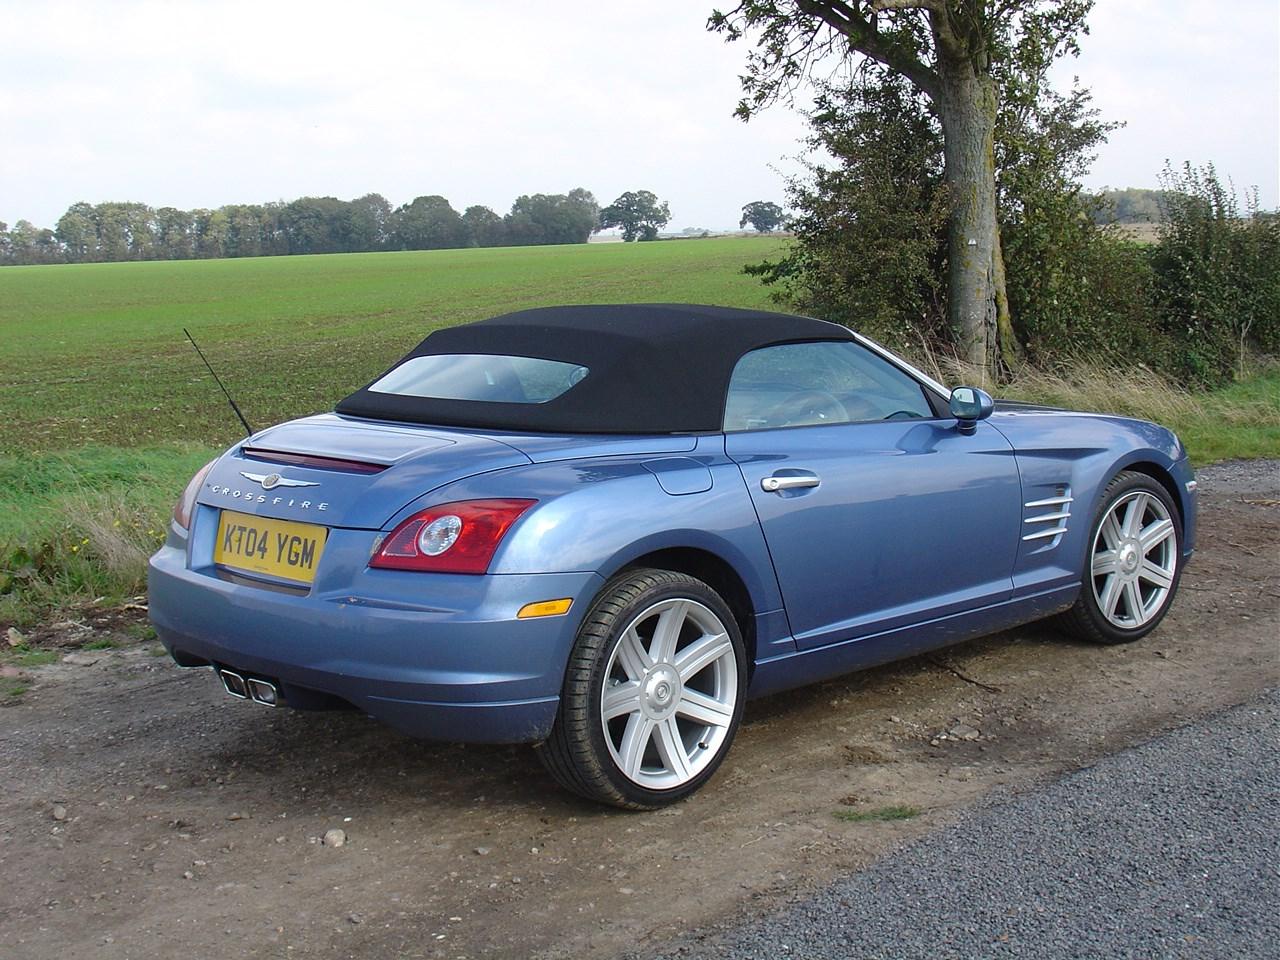 used chrysler crossfire roadster 2004 2008 review parkers. Black Bedroom Furniture Sets. Home Design Ideas